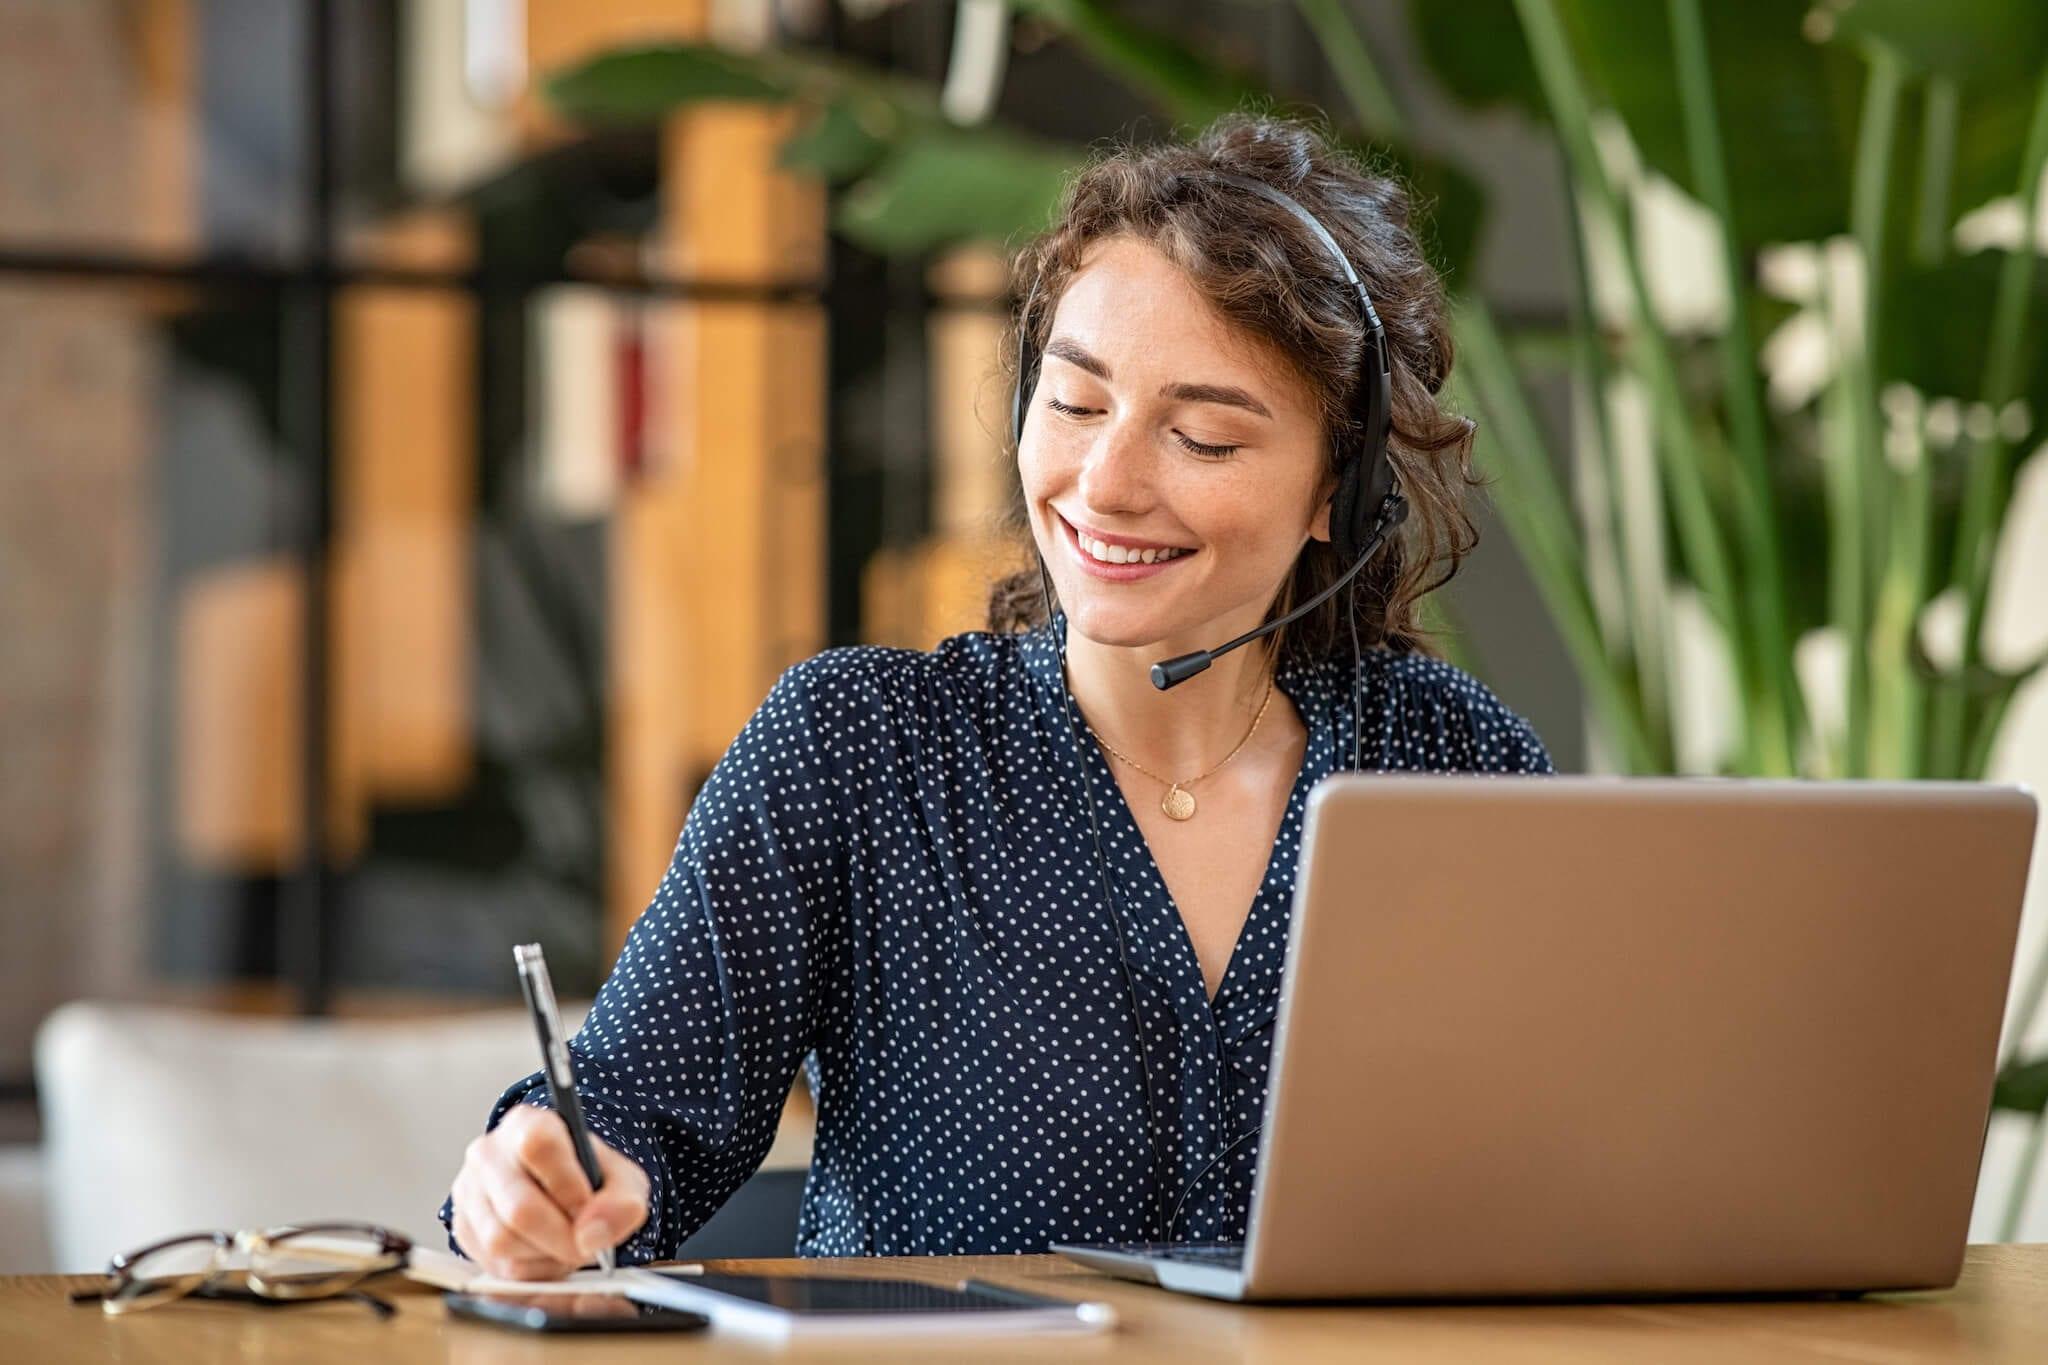 Ipcortex Launches New Call Recording Service Callstash